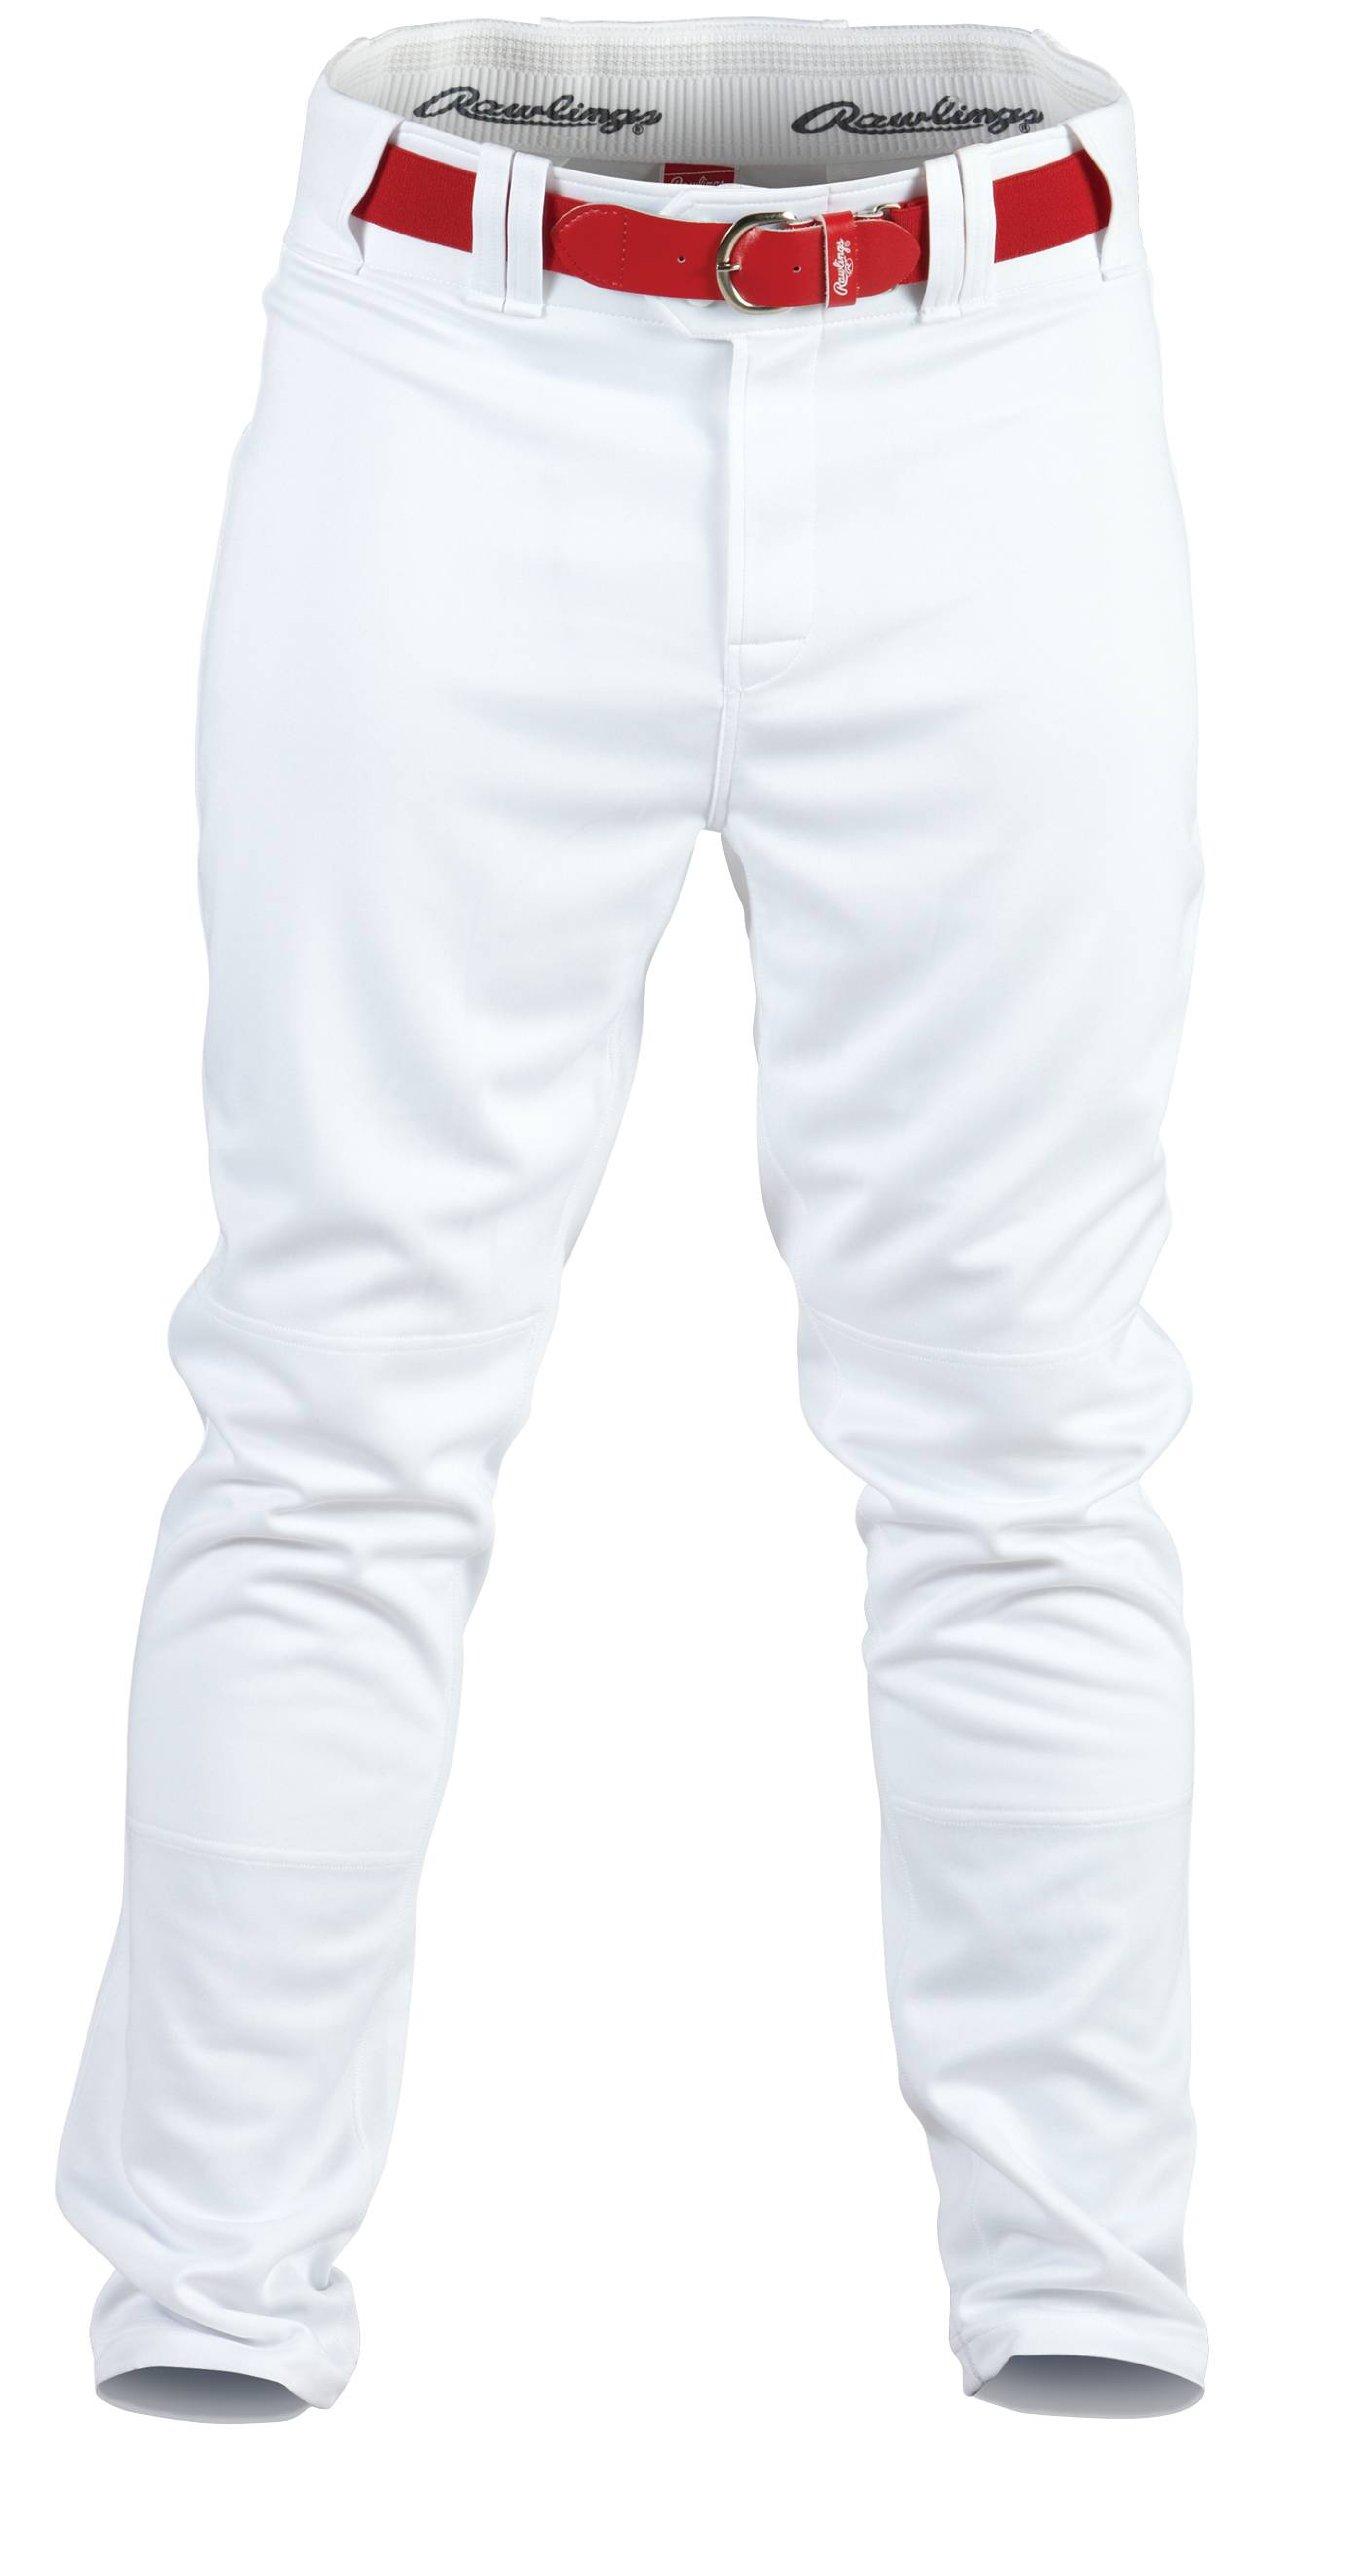 Rawlings Youth Baseball Pant (White, Small) by Rawlings